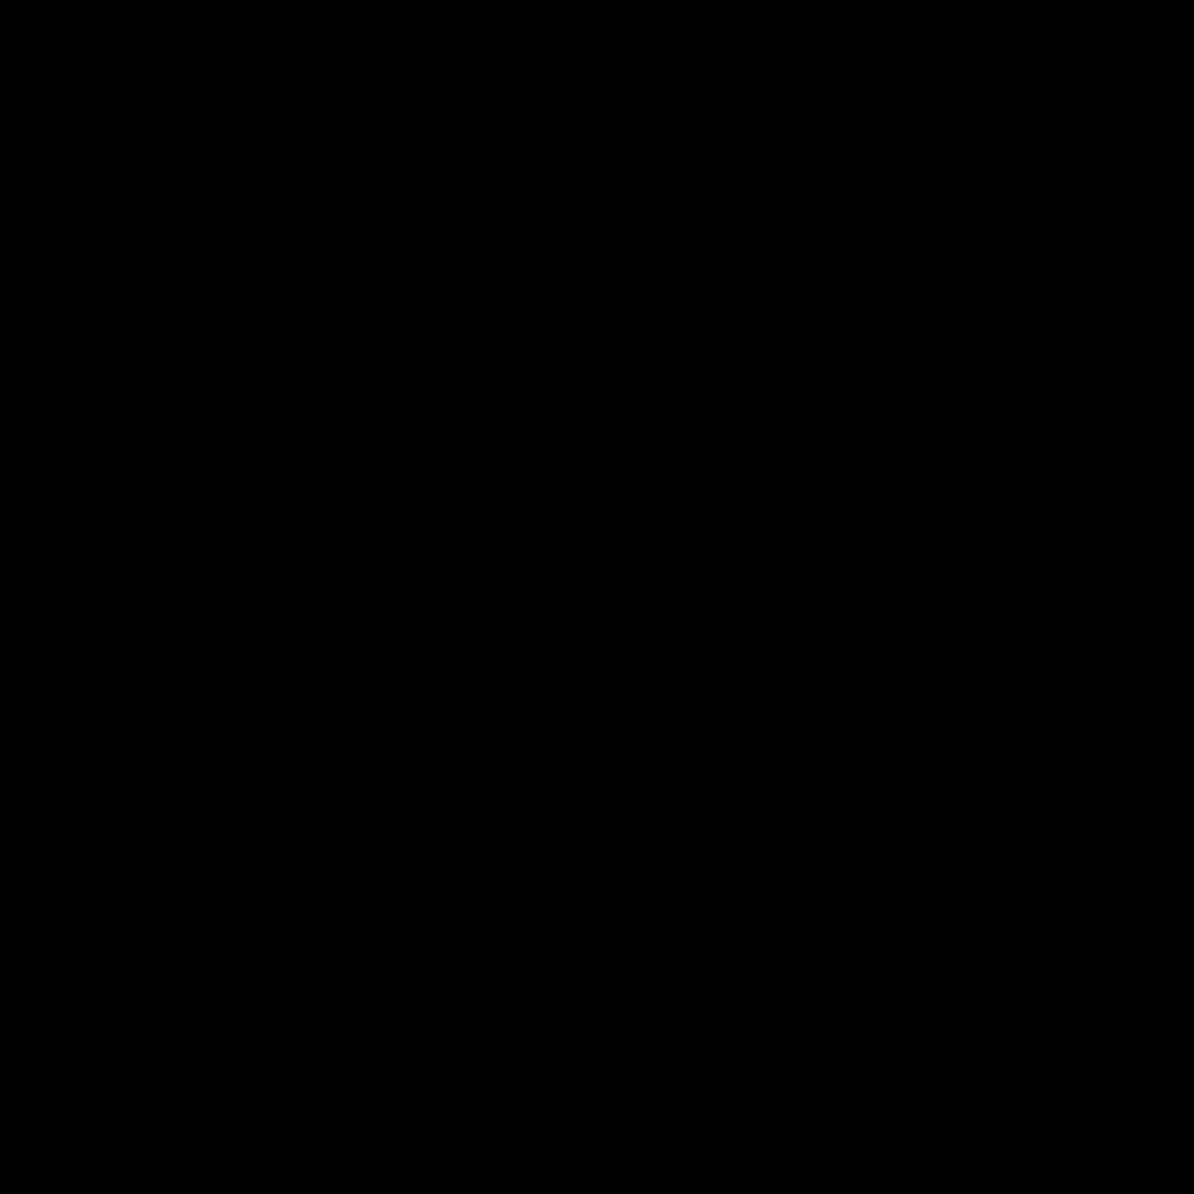 tietar-2020-06-27